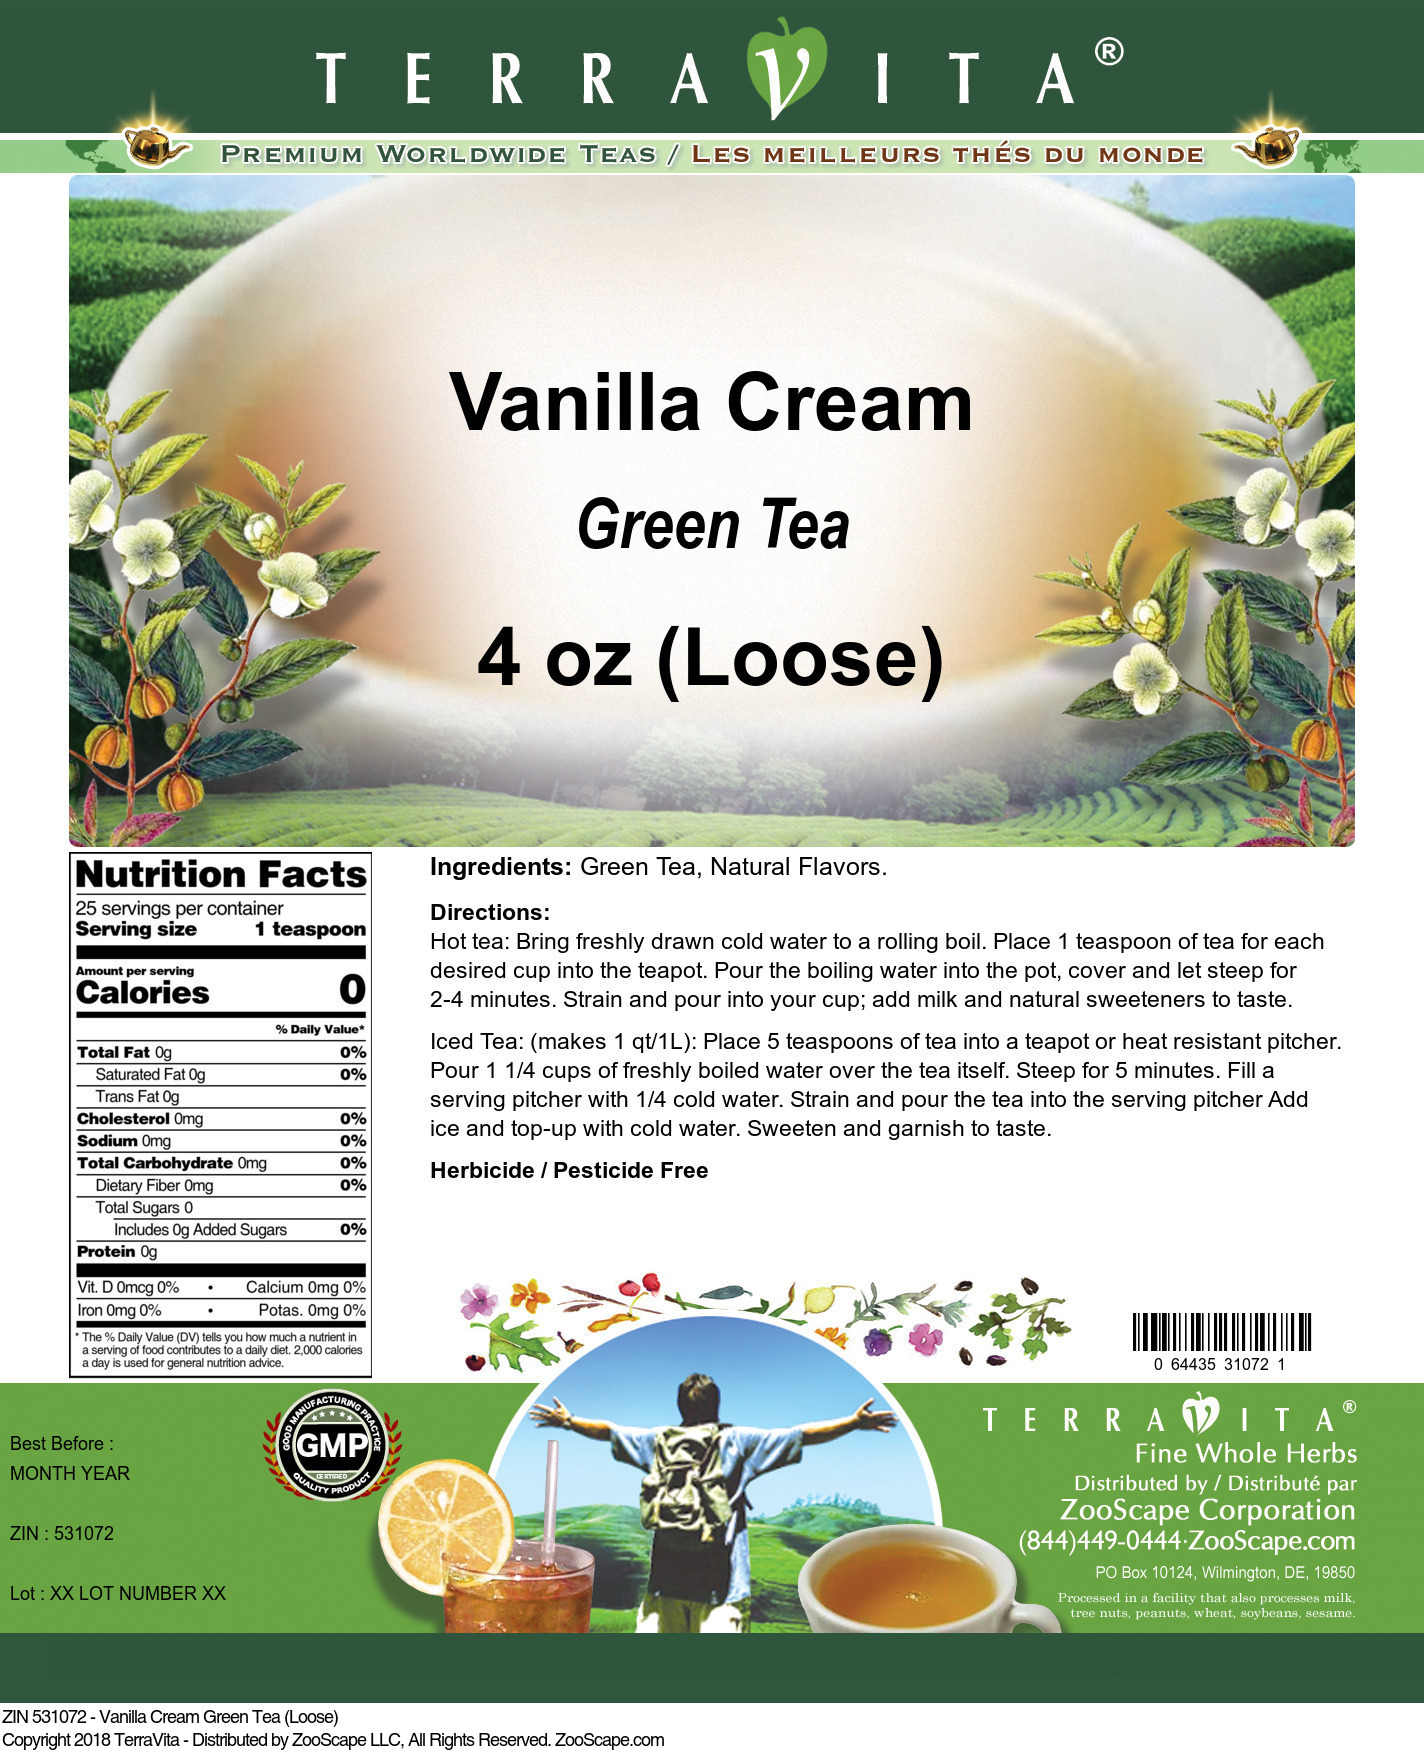 Vanilla Cream Green Tea (Loose)